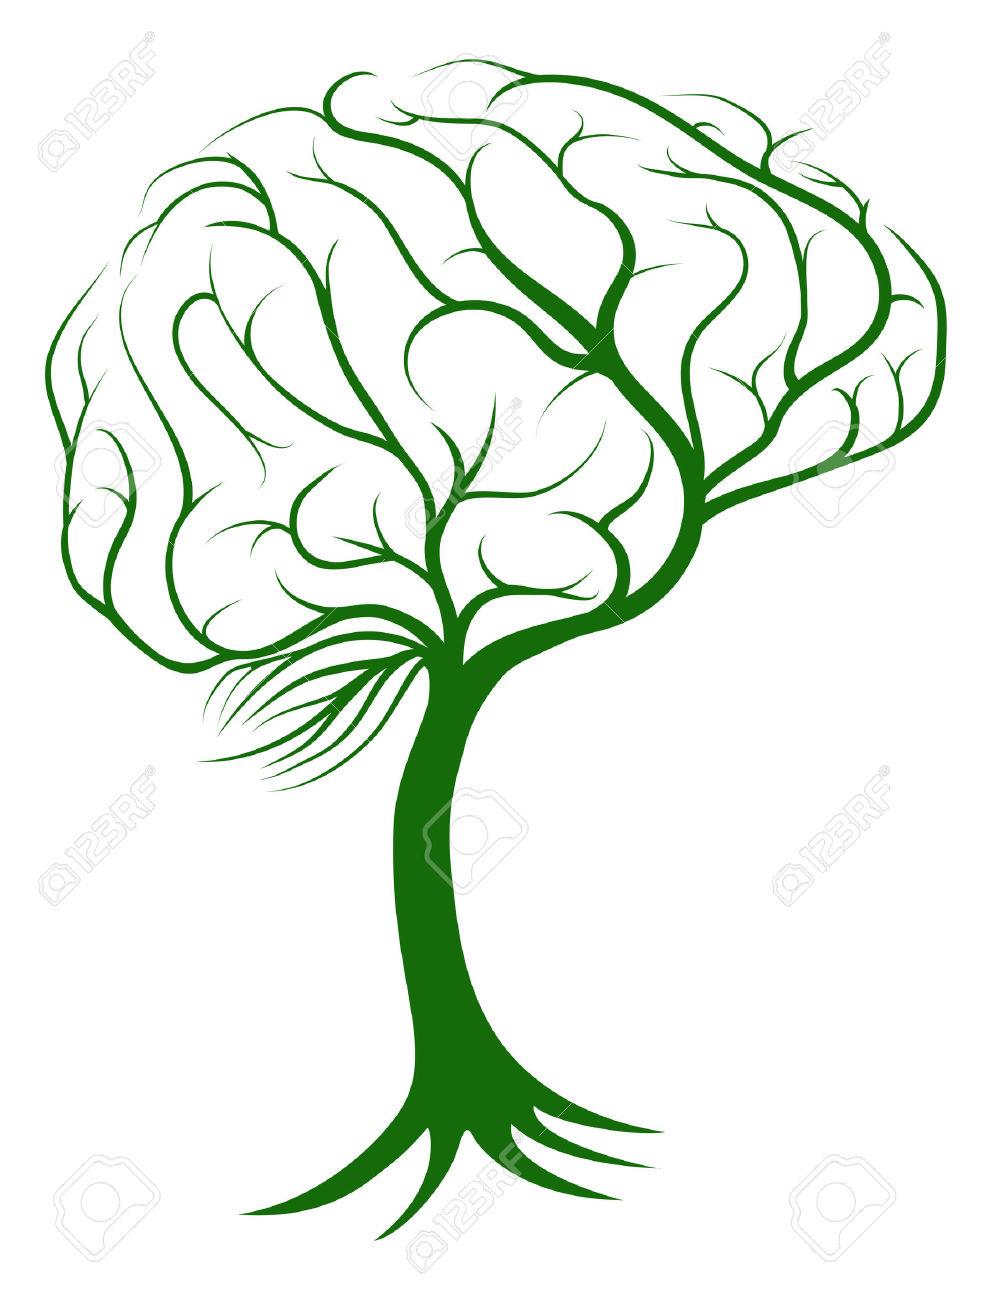 992x1300 Growing Brain Clipart